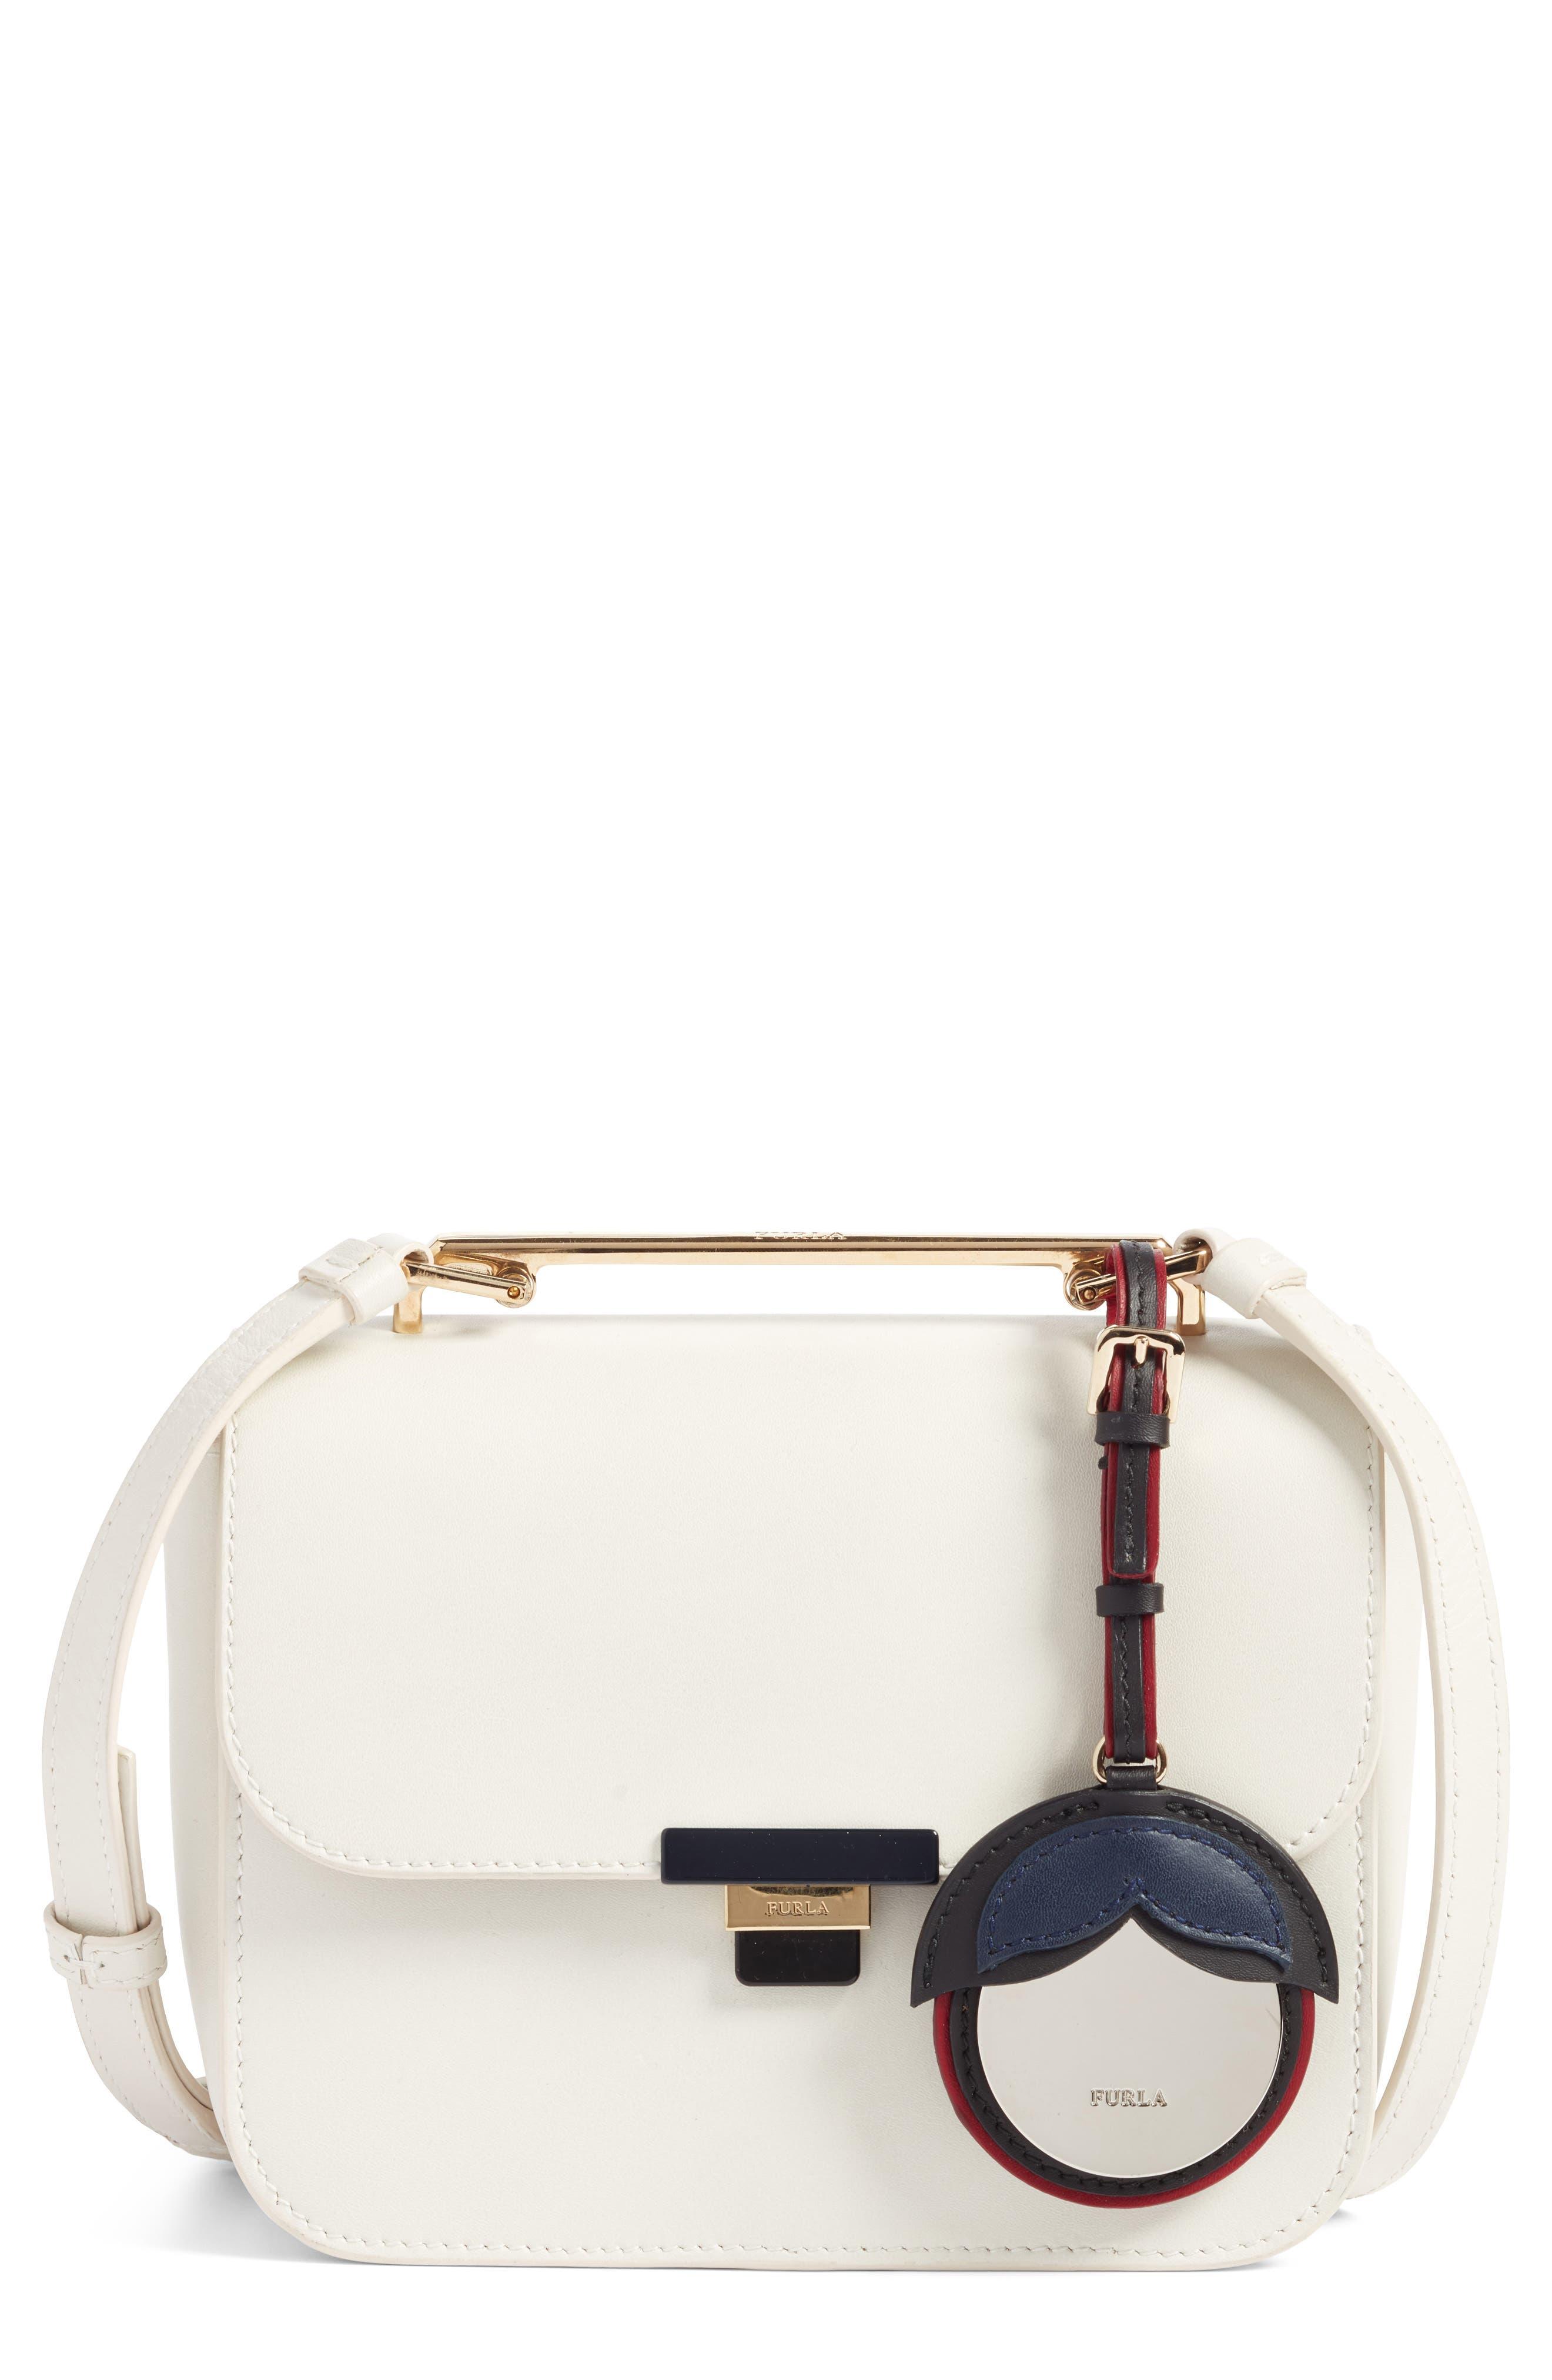 Elisir Mini Crossbody Bag,                             Main thumbnail 1, color,                             Petalo